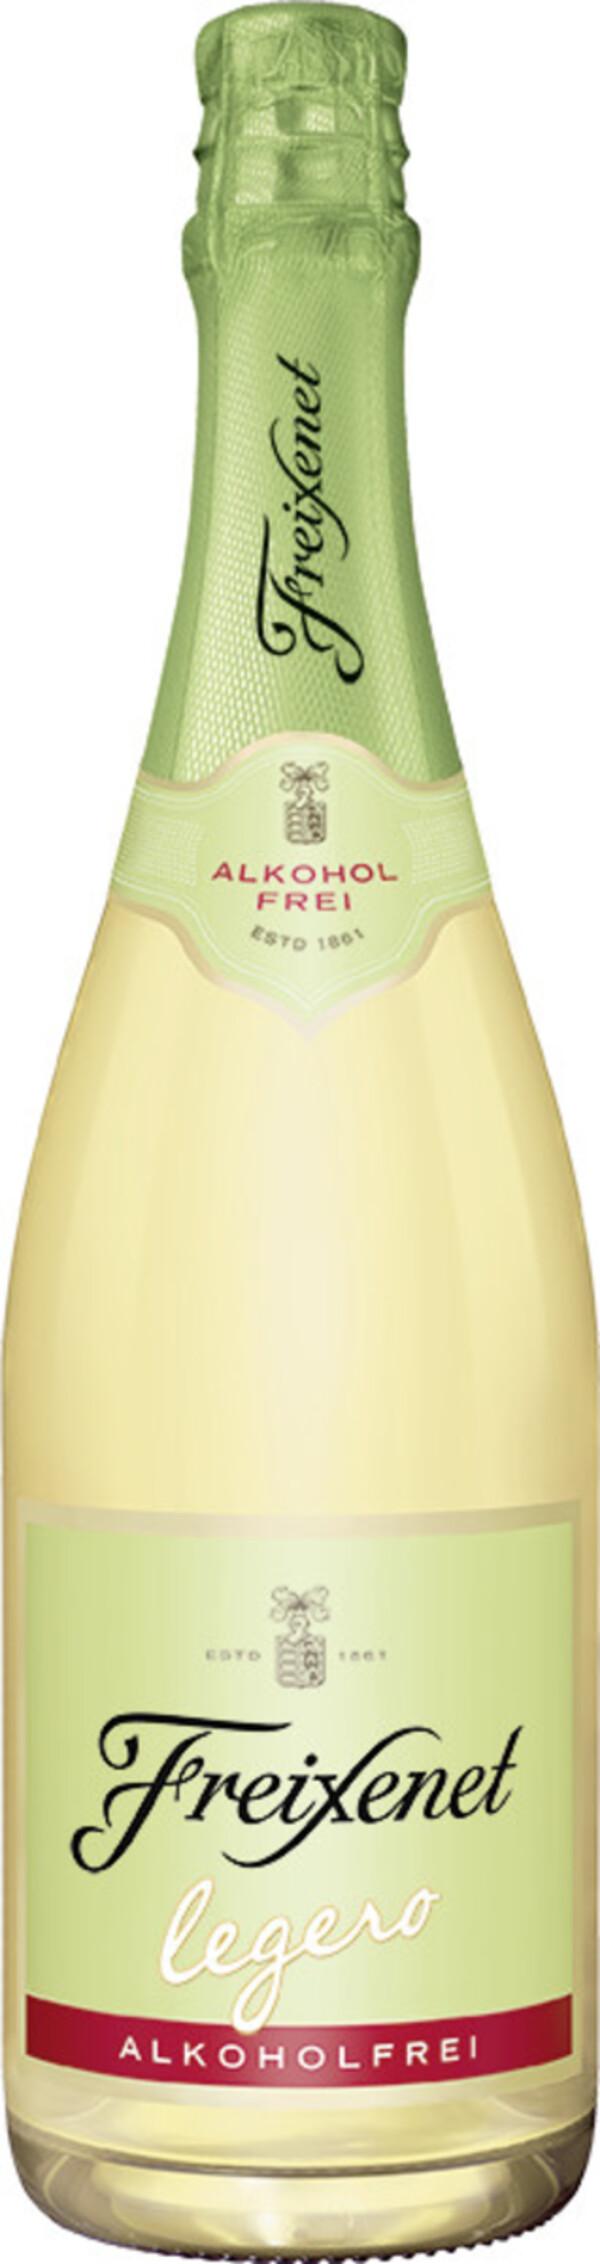 Freixenet Legero Alkoholfrei 0,75 ltr